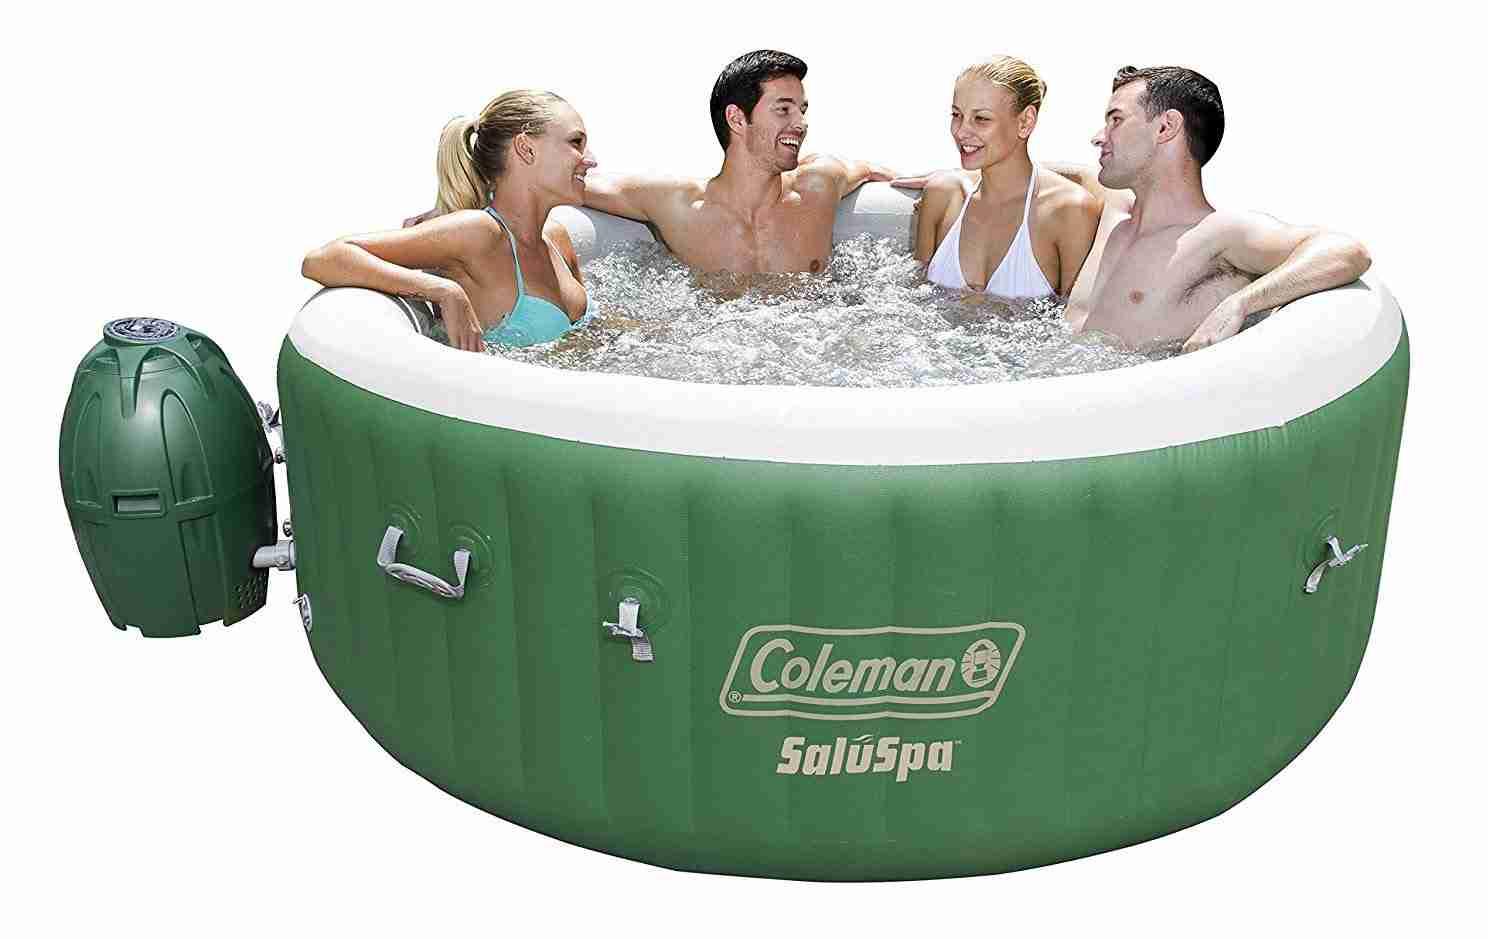 10 Cheap Hot Tubs Under $500 - Best Hot Tub Reviews